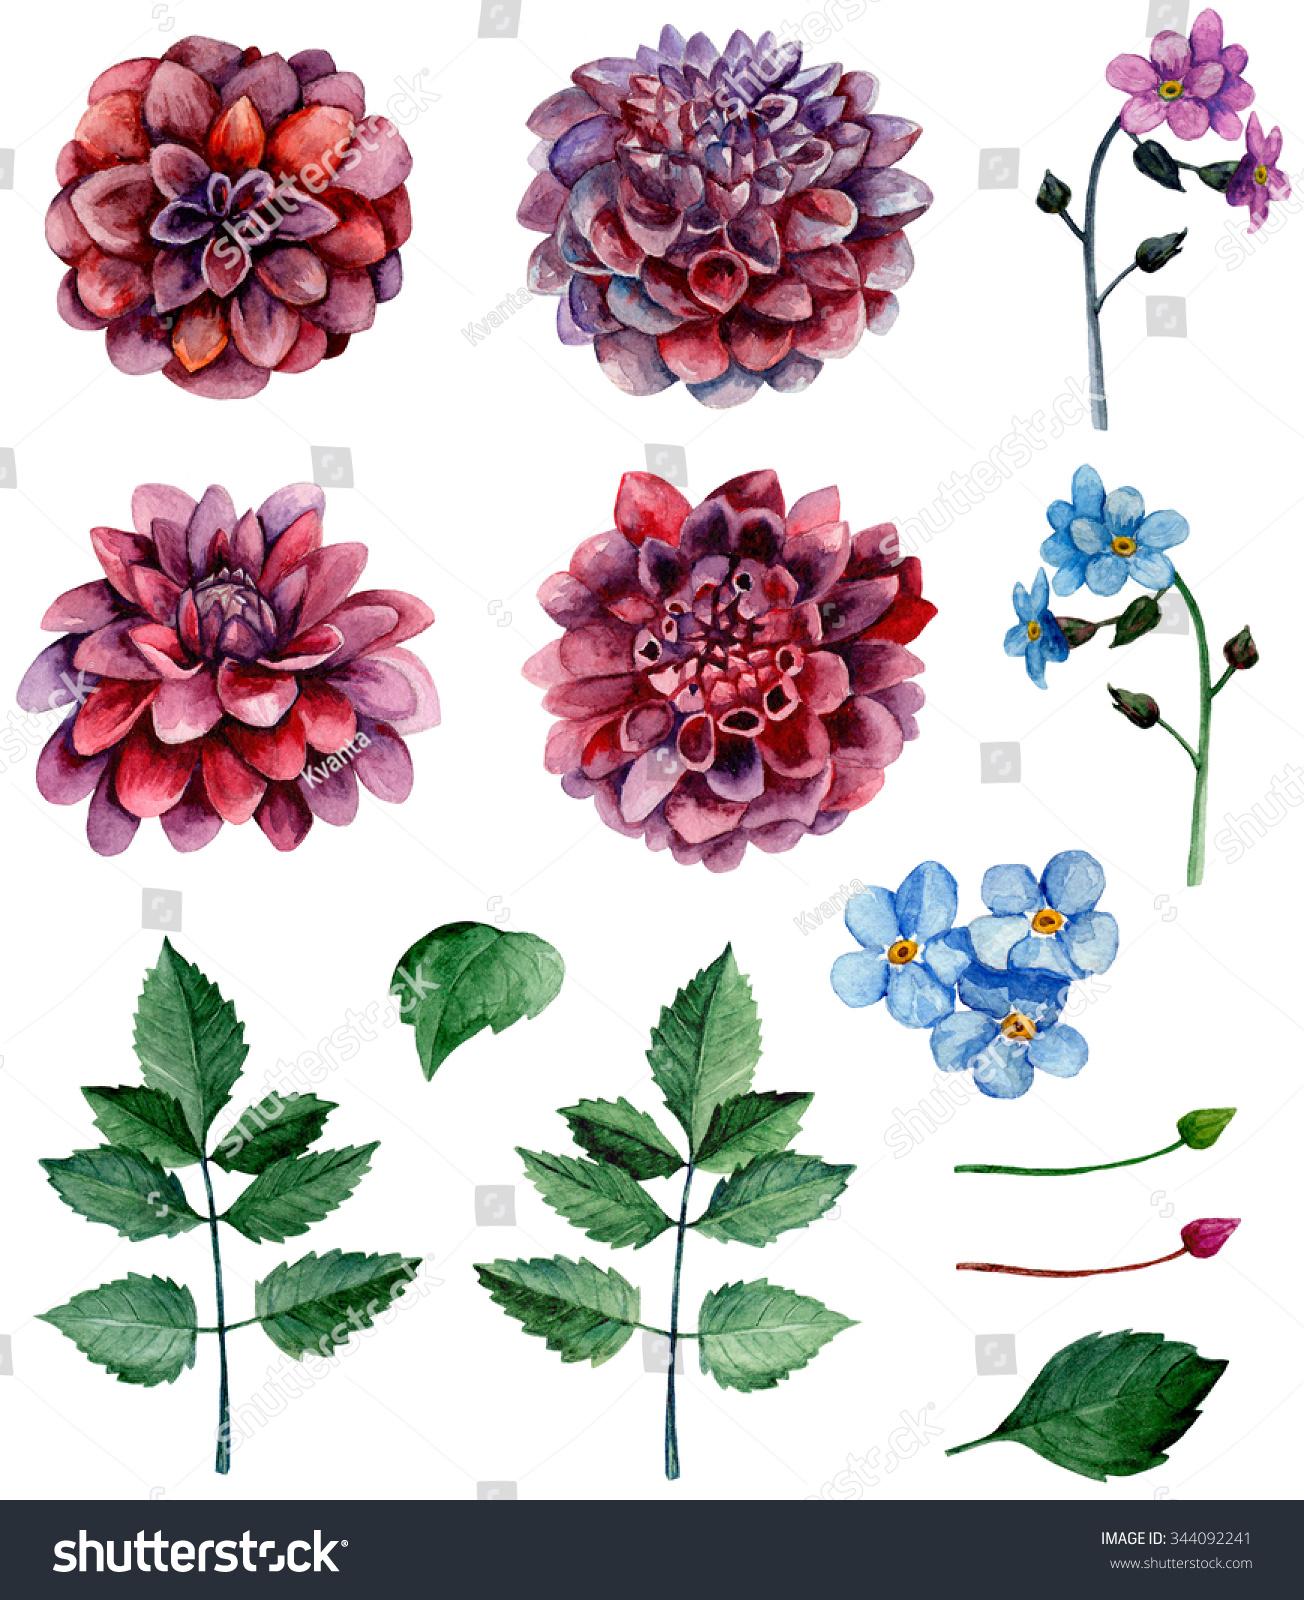 Watercolor blossom dahlias flowers clip art stock illustration watercolor blossom dahlias flowers clip art izmirmasajfo